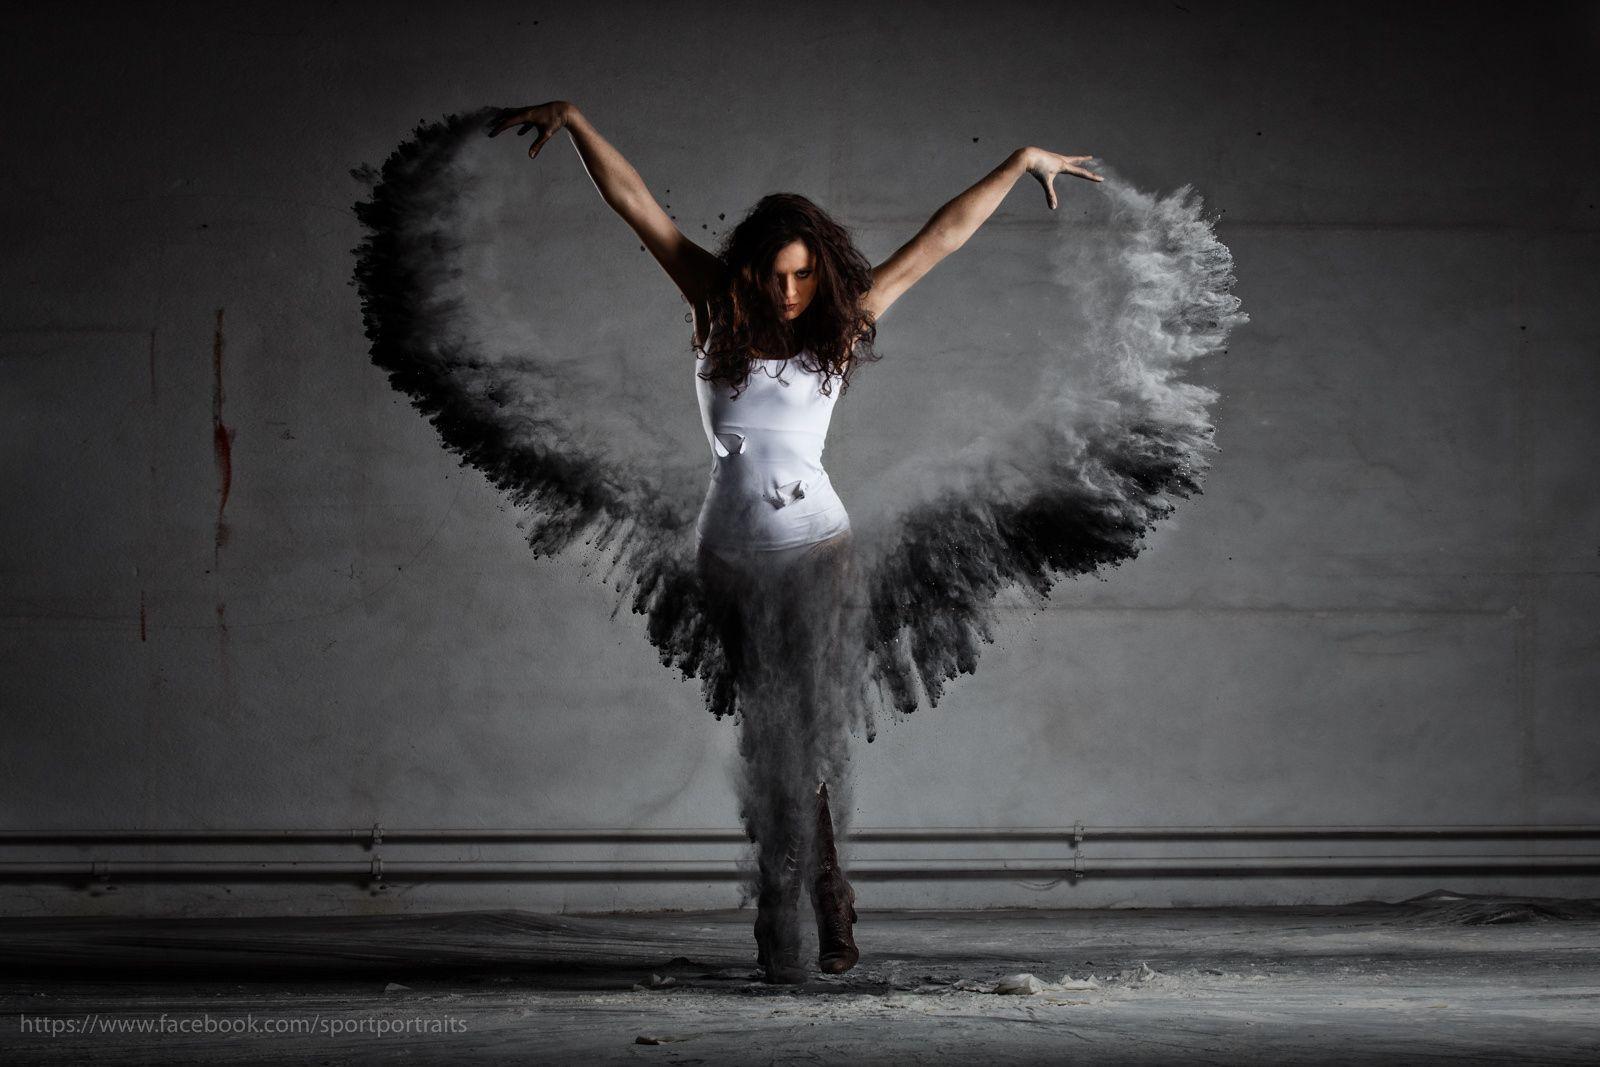 Dark Angel Mehlshooting Mit Tanzerin Dark Angel With Wings Of Dust Flour Dust Shooting With Strobes In An Ab Dans Fotografciligi Resimler Sanat Kadinlar